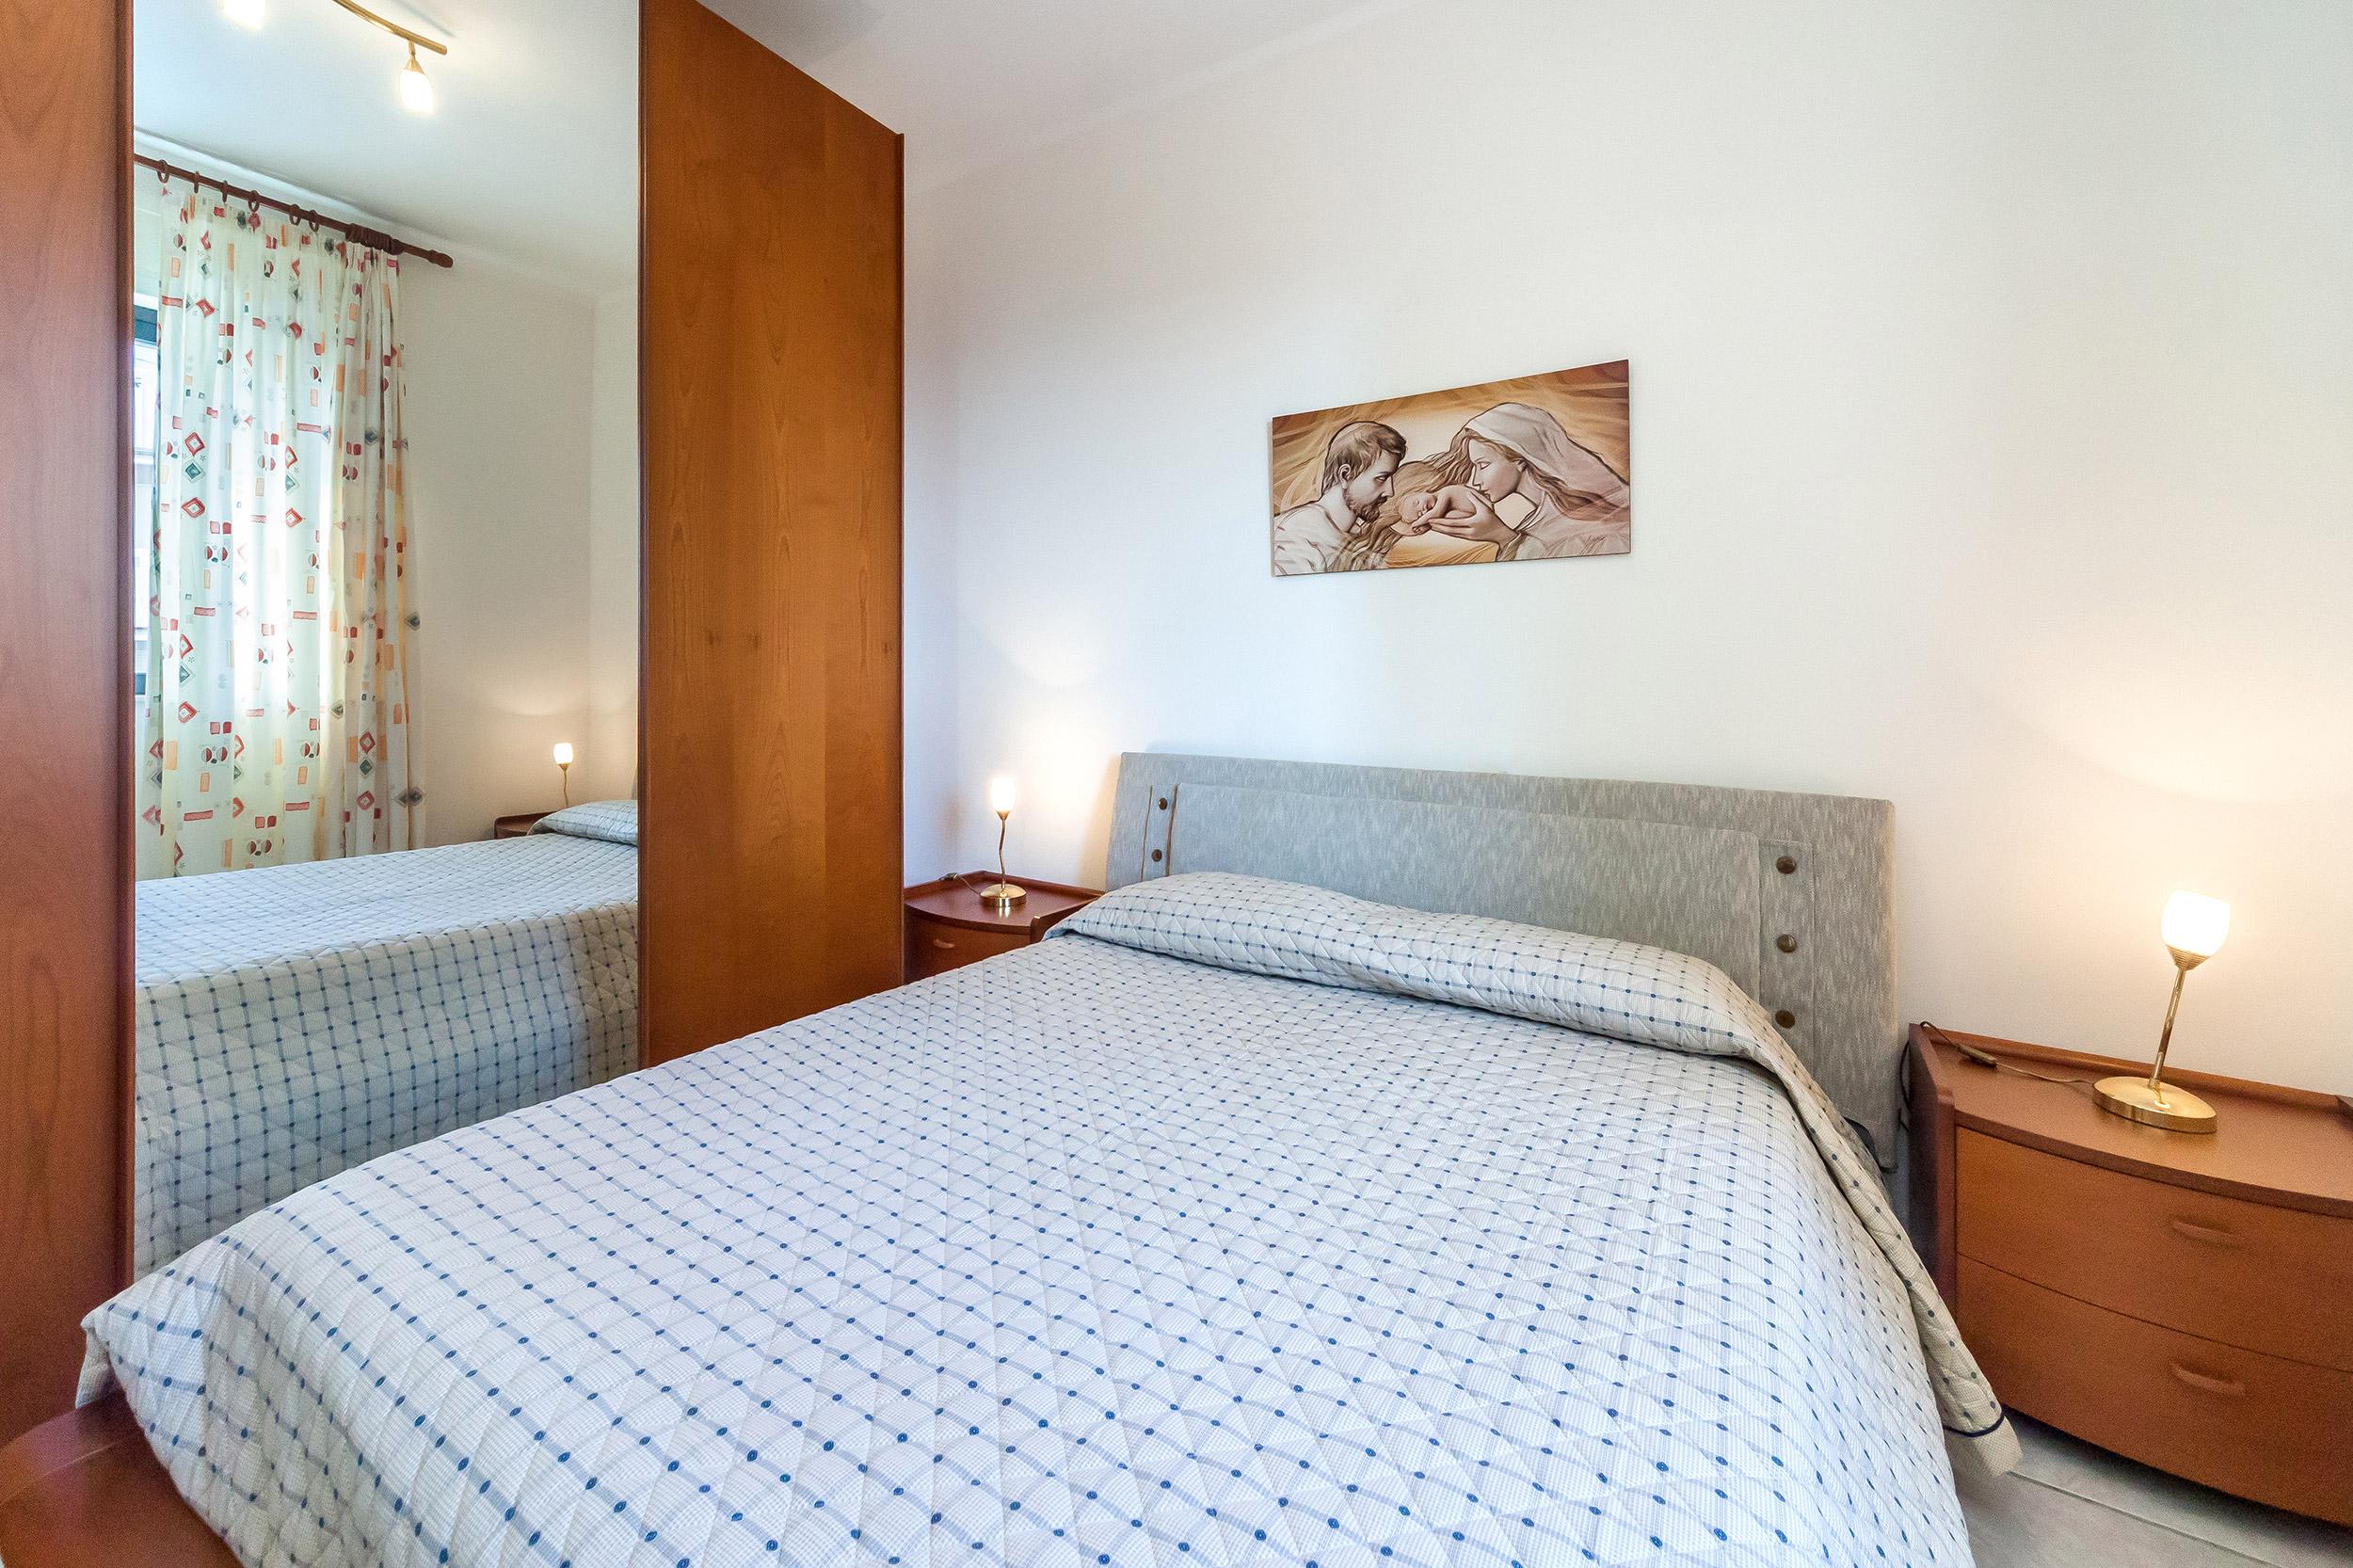 Ferienwohnung Appartamento vista mare a Gallipoli 4/6 posti - Baia Blu Side (2574458), Gallipoli, Lecce, Apulien, Italien, Bild 10